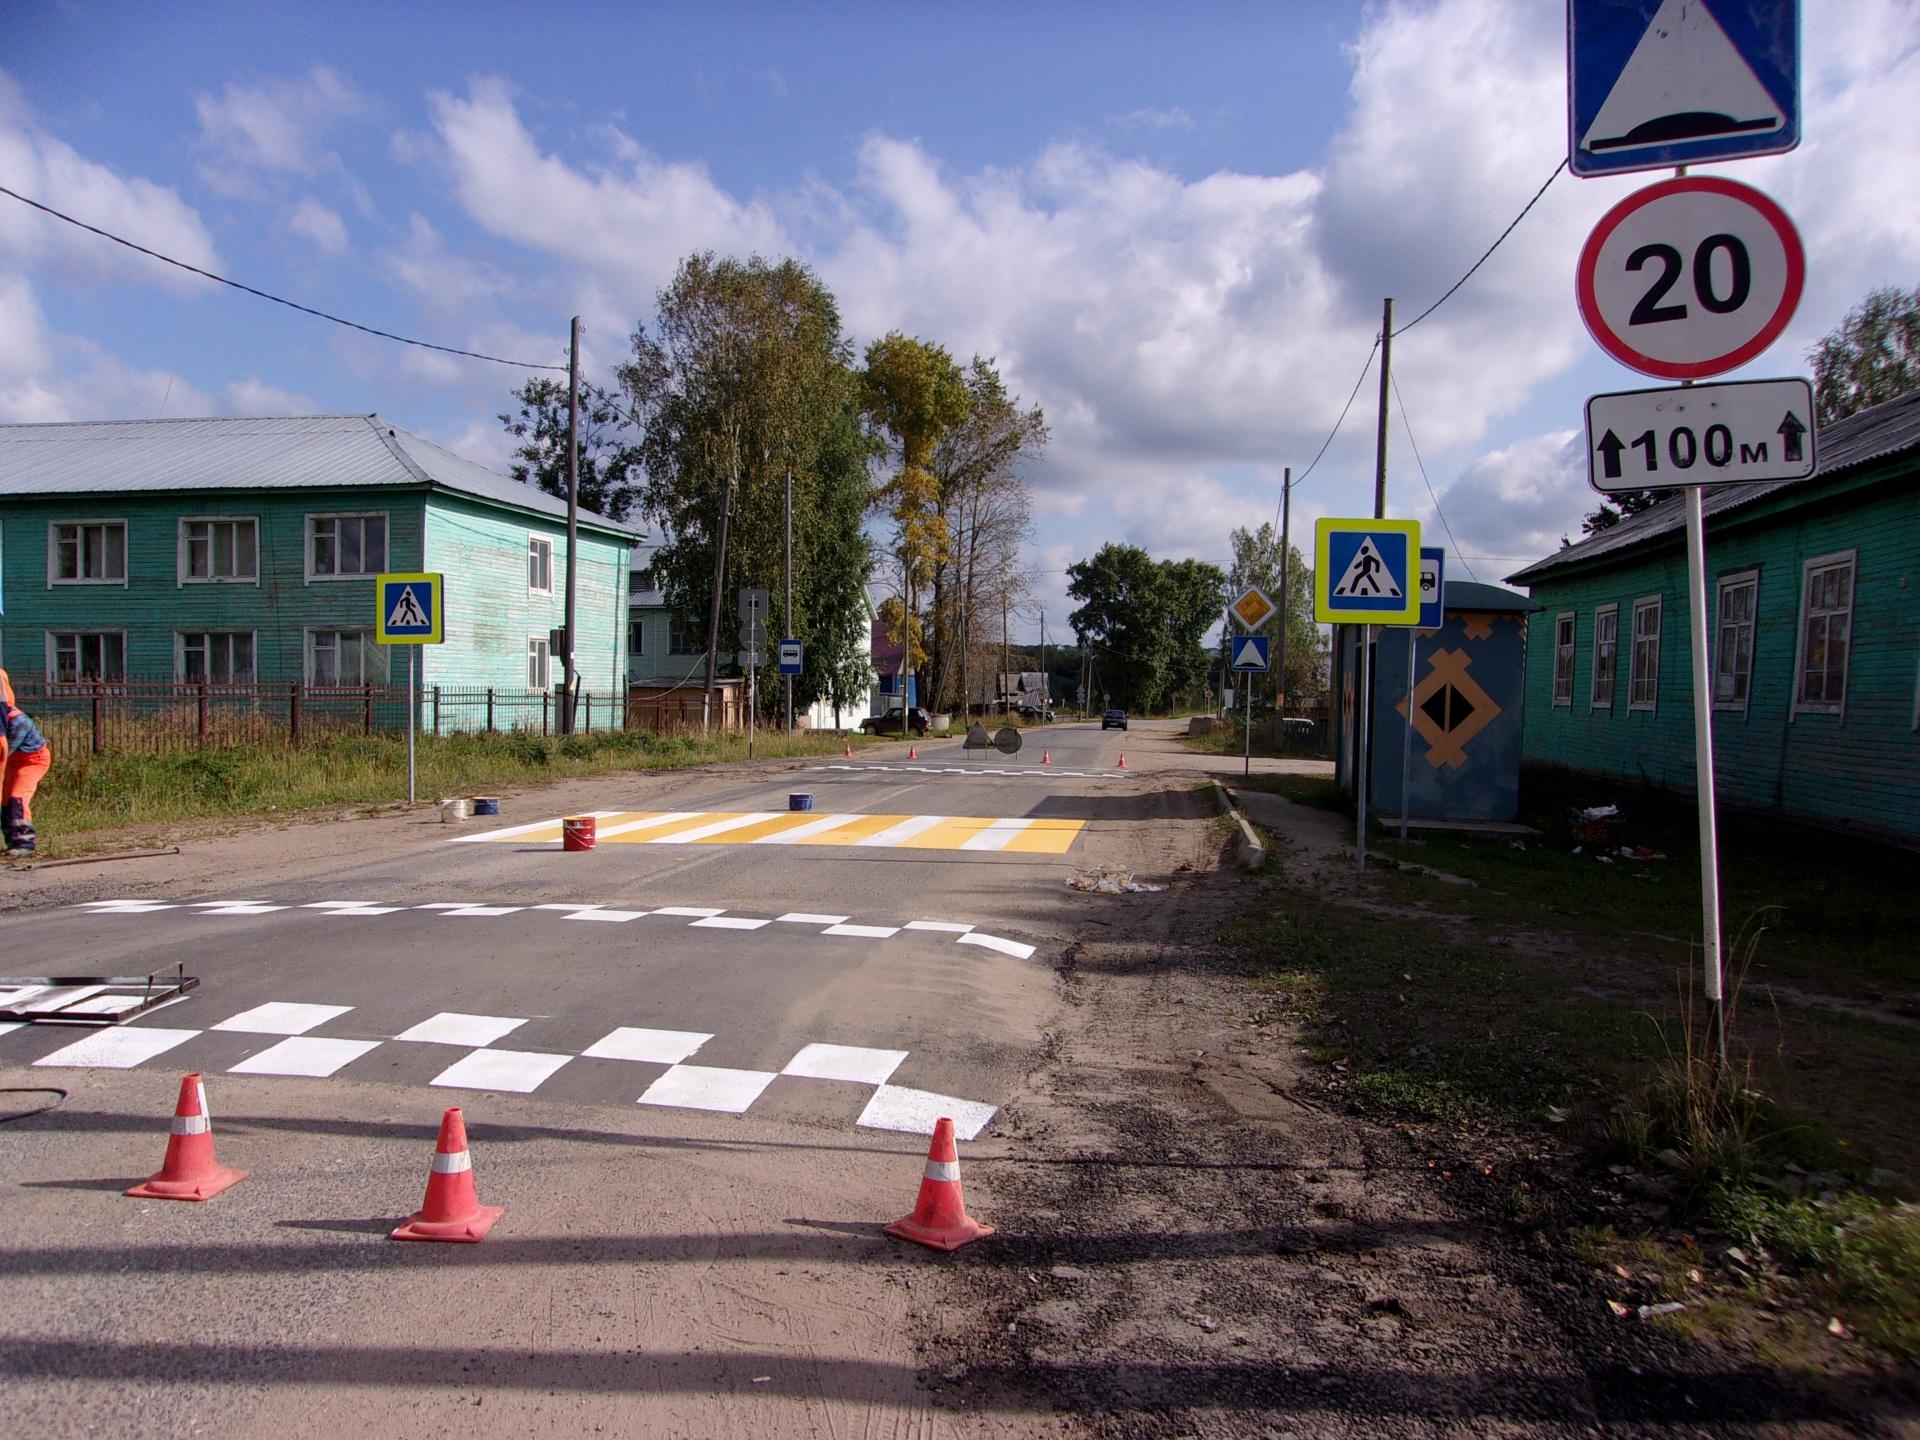 01-10-2019_Komi_reliz_V-Koigorodskom-i-Priluzskom-raionah-oborudovano-6-peschehodnyh-perehodov-Koidin-3.JPG